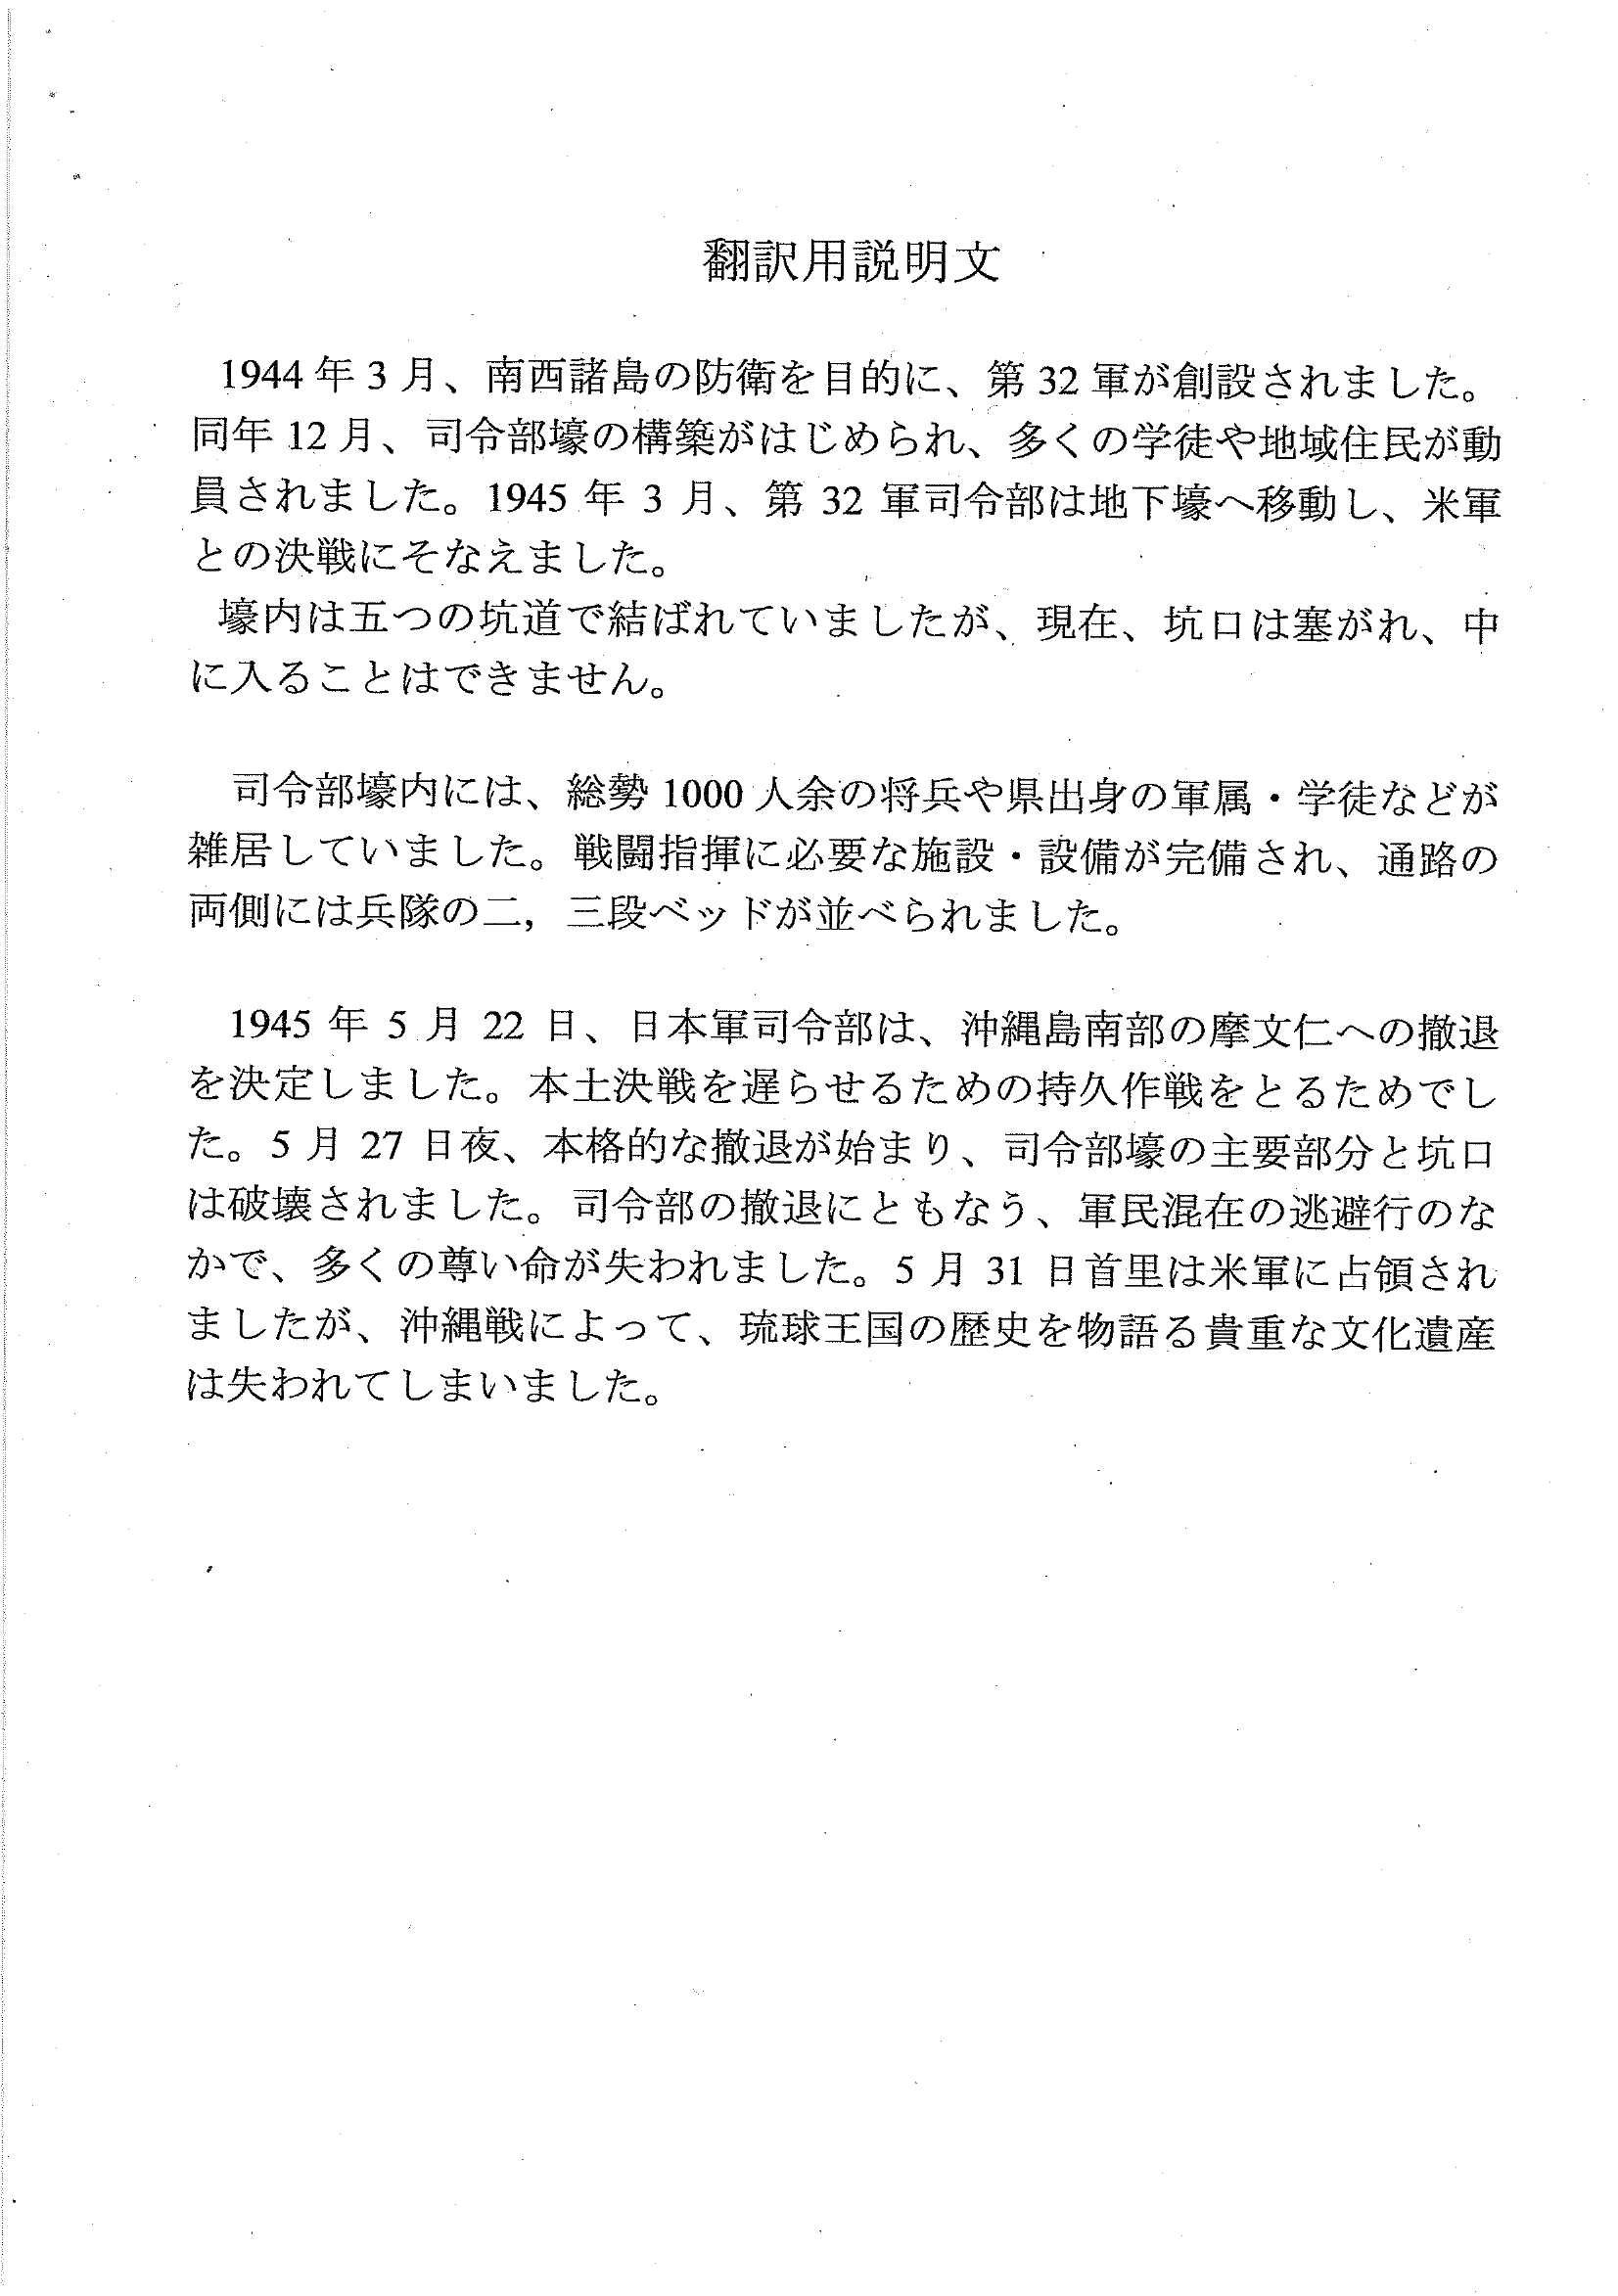 setumeibun_kensyusei-2.jpg